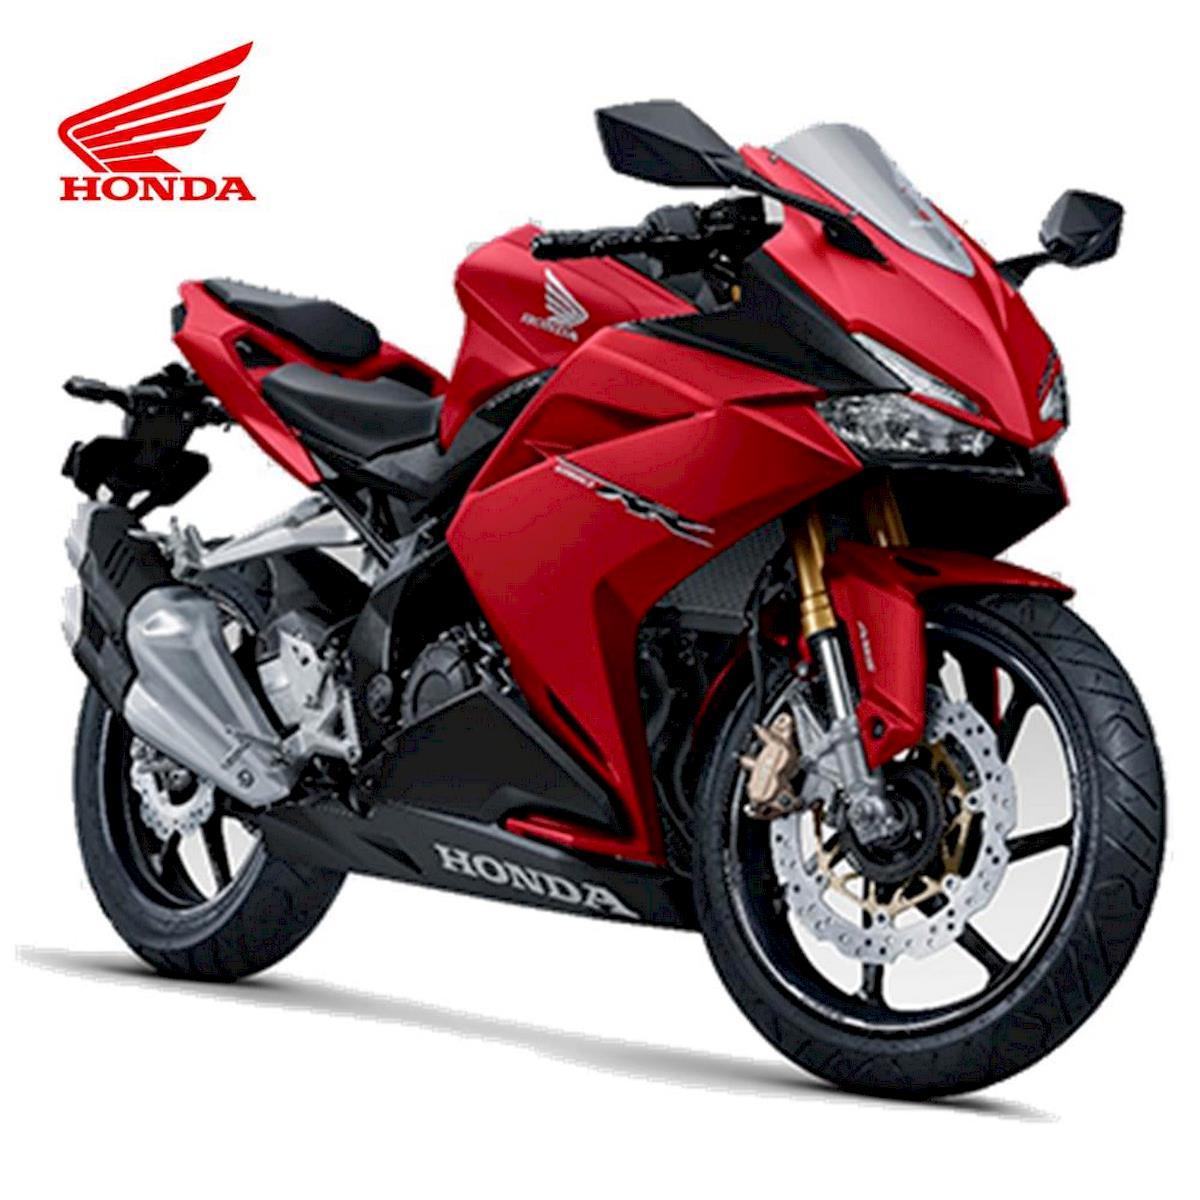 Image of HONDA CBR 250